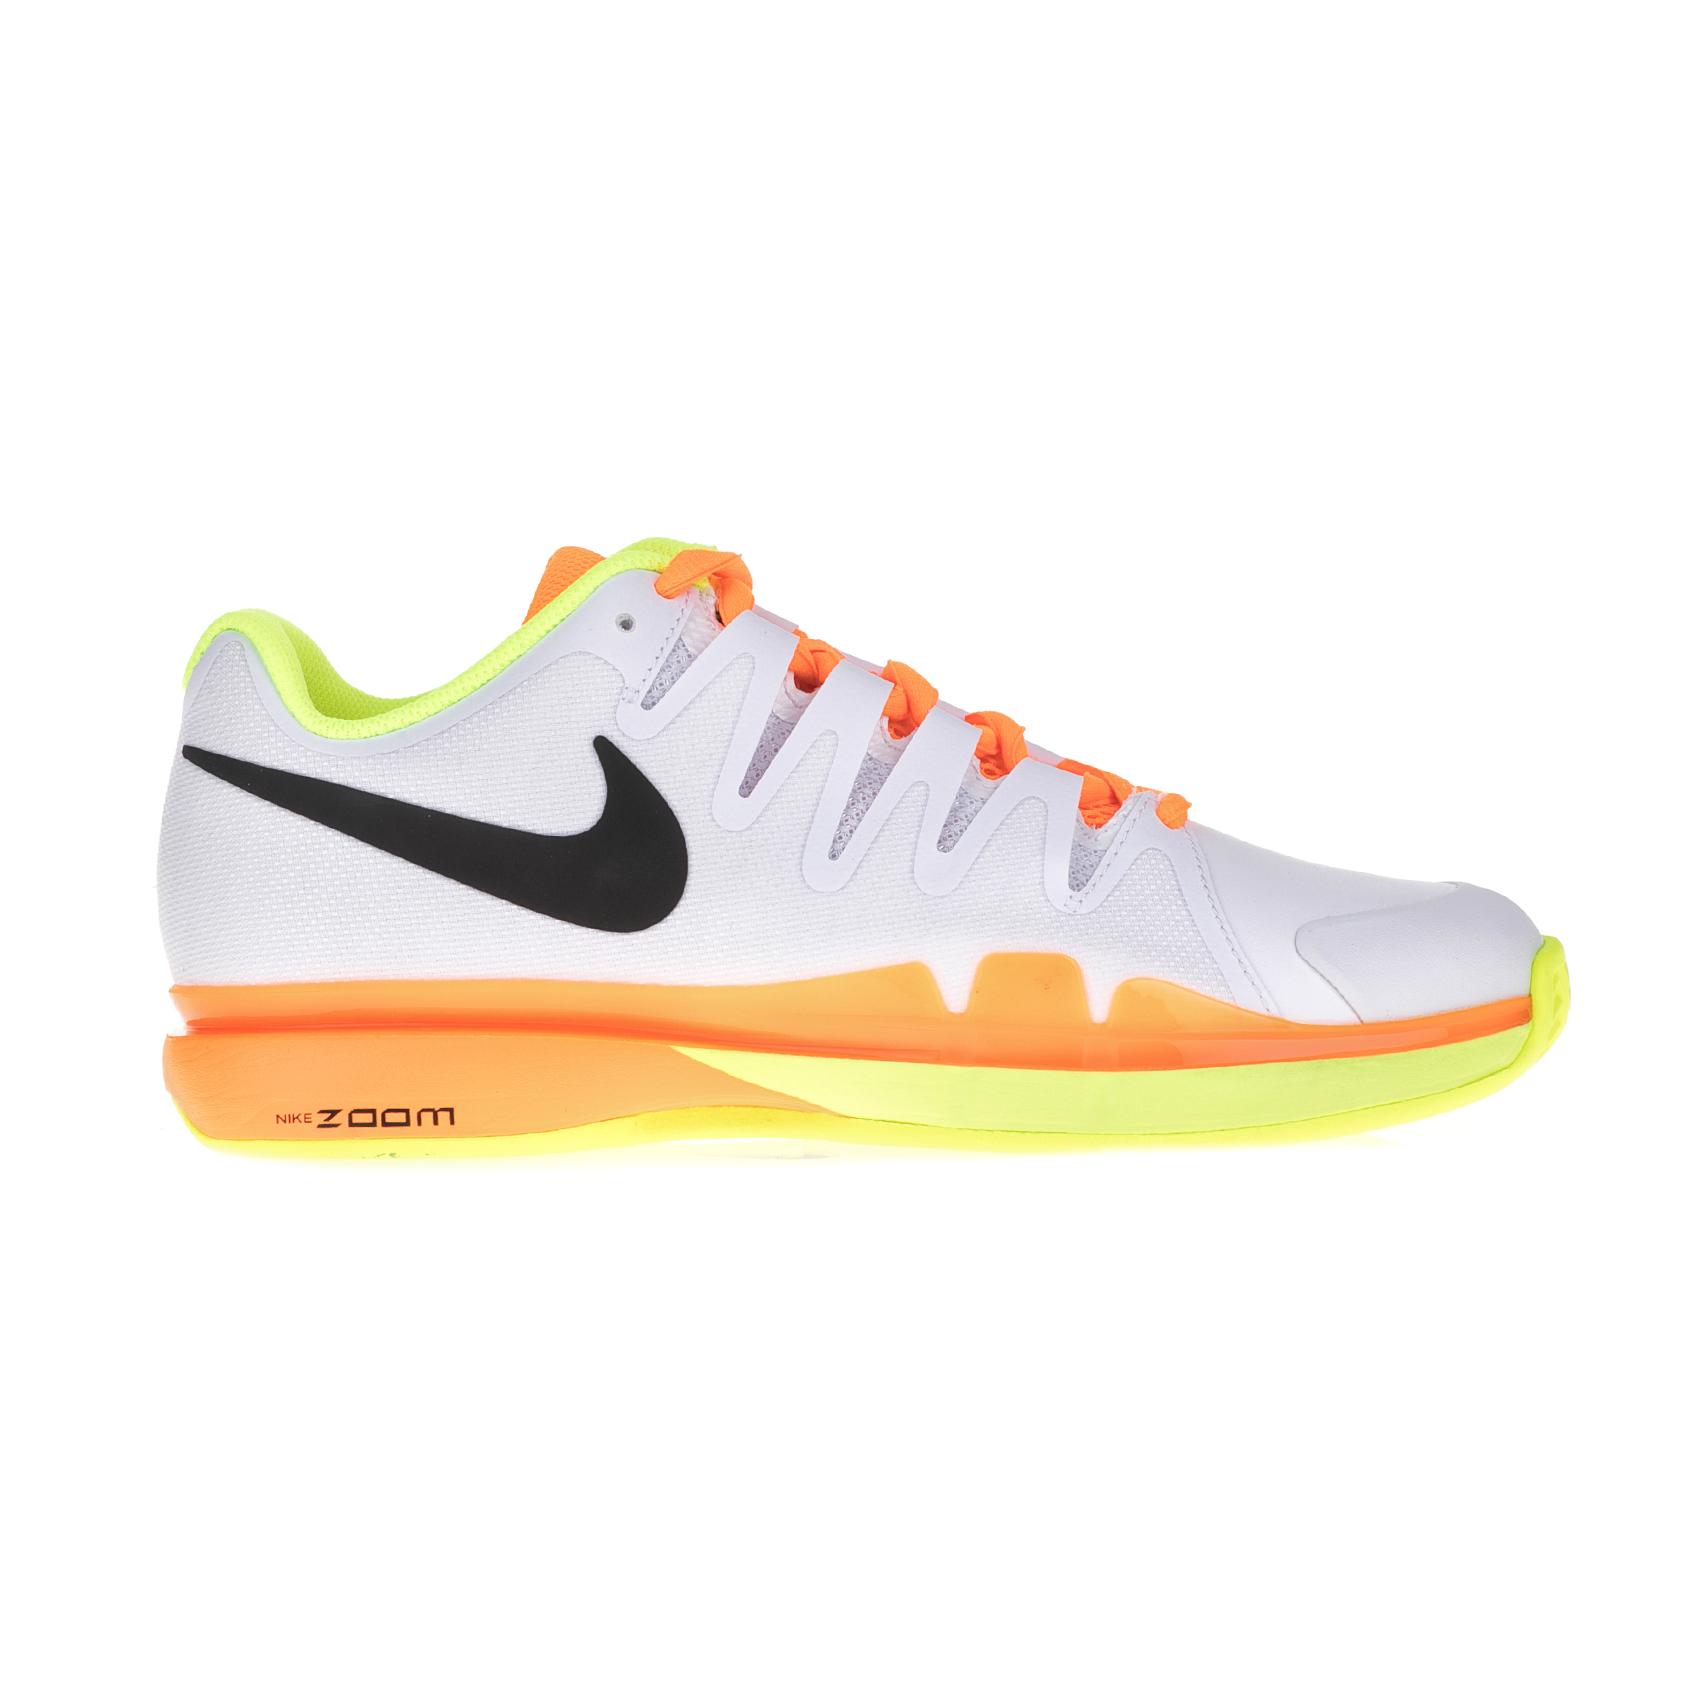 NIKE – Ανδρικά παπούτσια τένις Nike ZOOM VAPOR 9.5 TOUR CLAY λευκά – πορτοκαλί